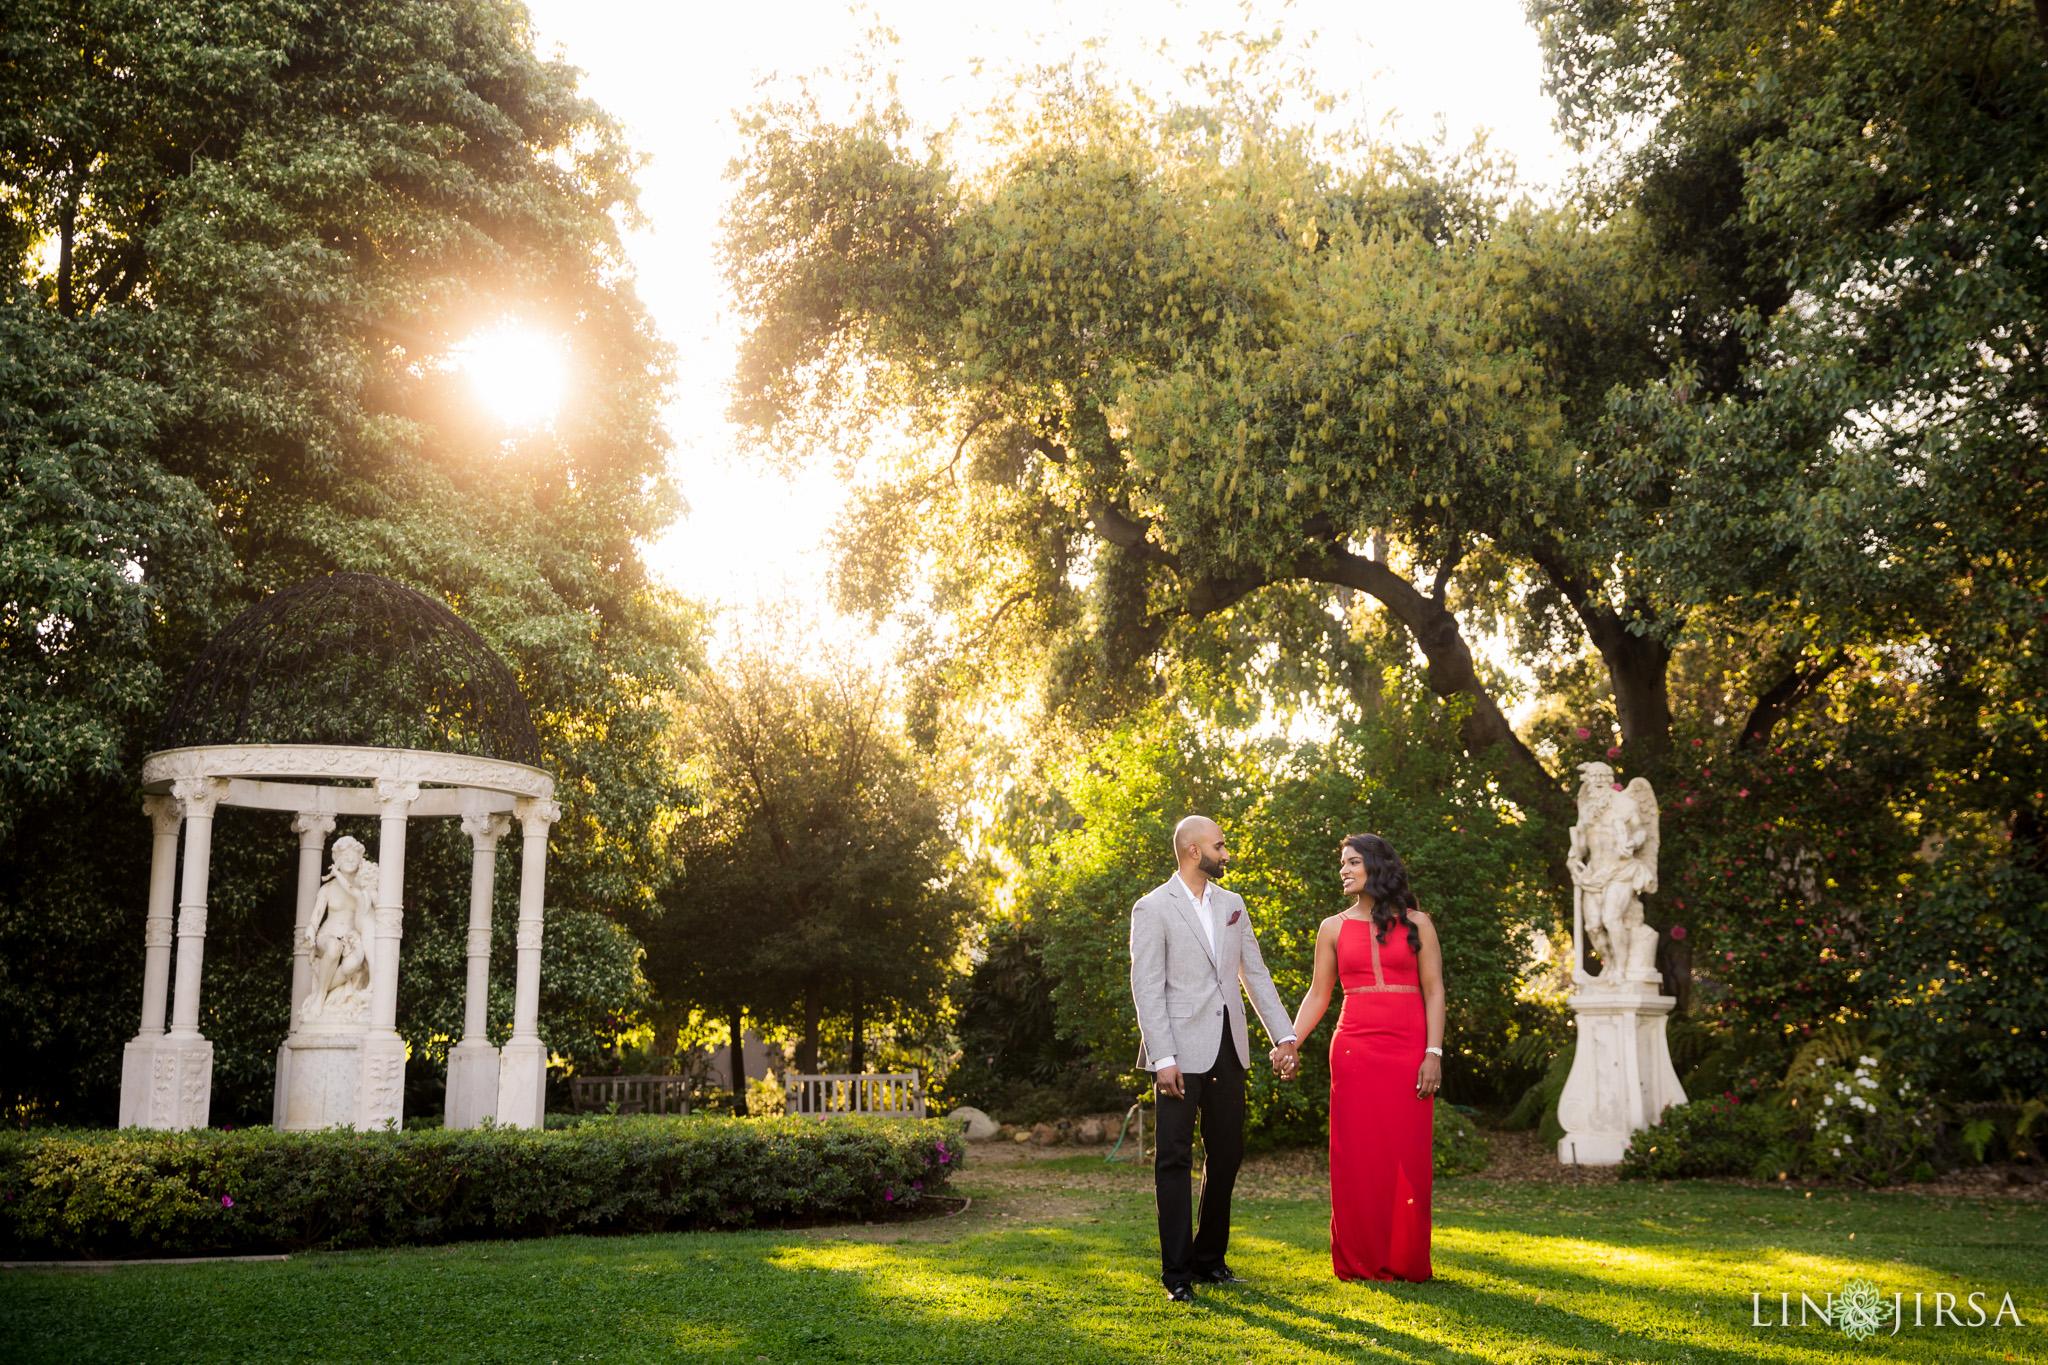 14-huntington-garden-engagement-photography